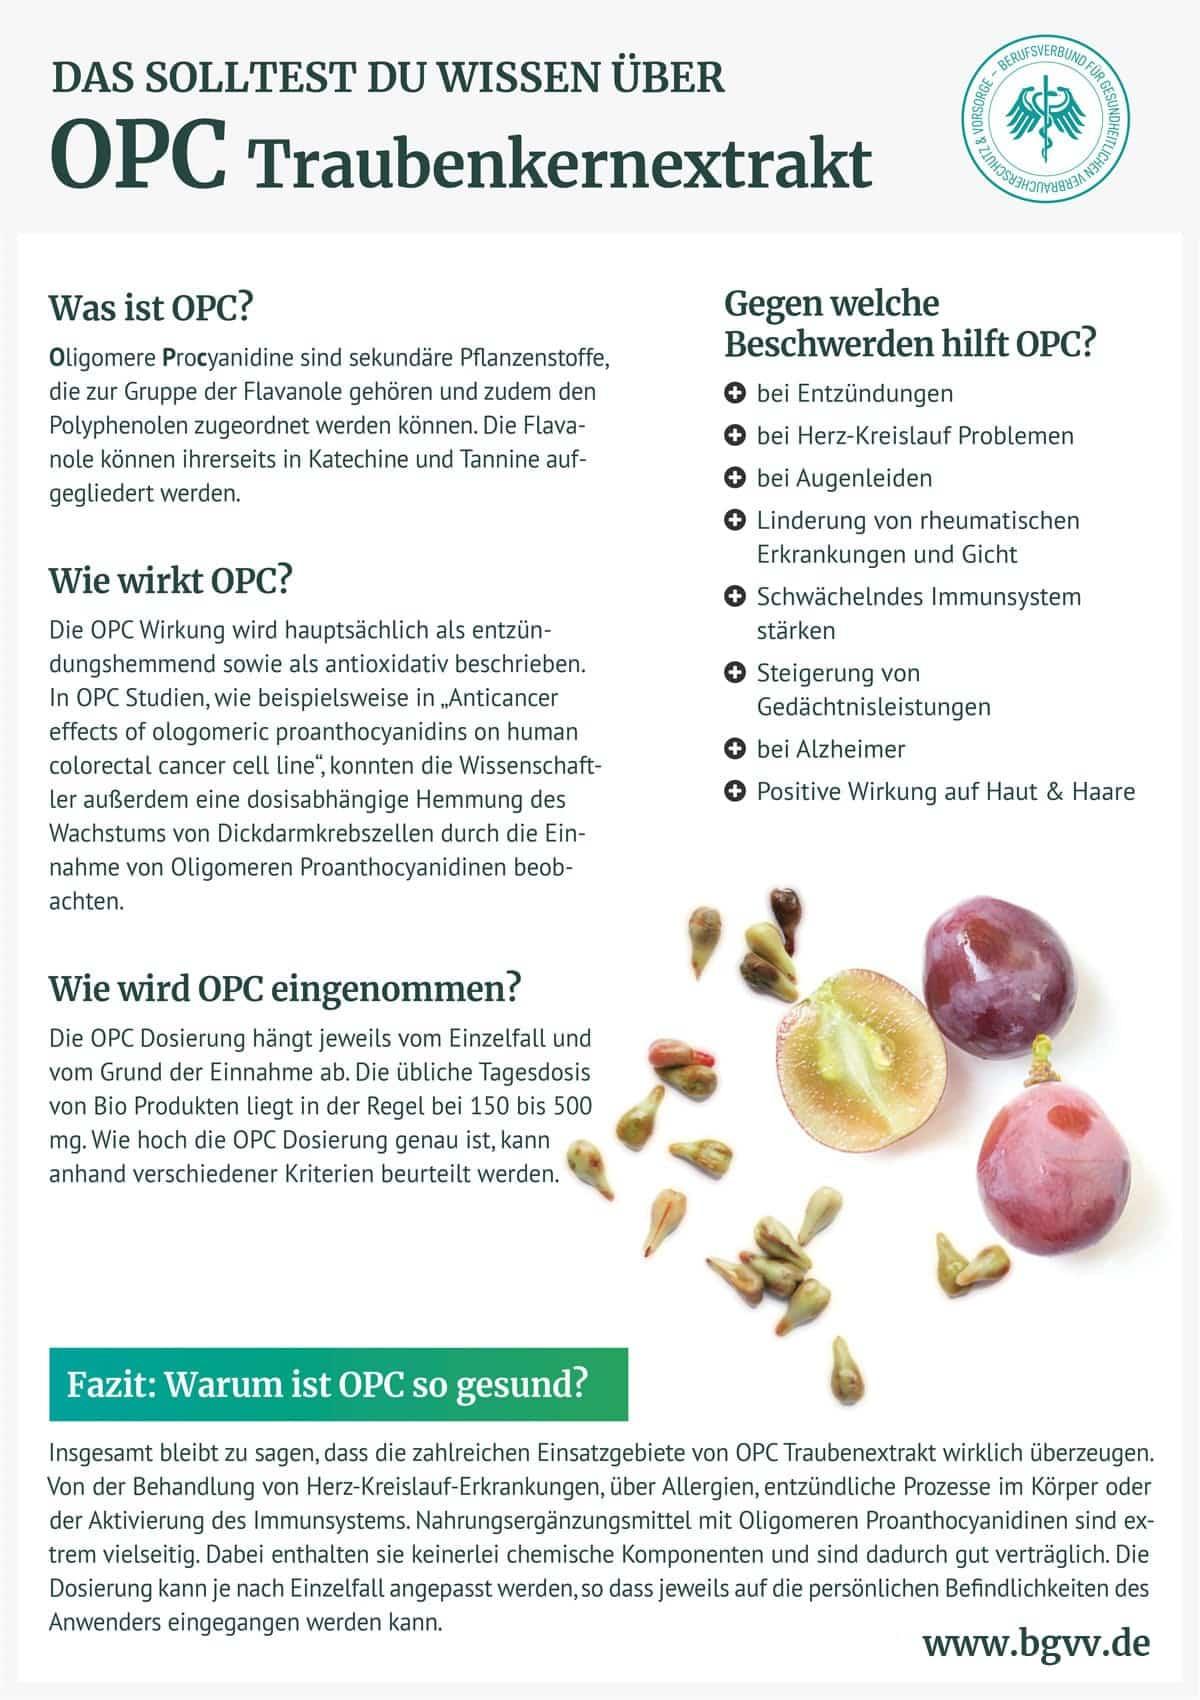 BGVV Infografik OPC